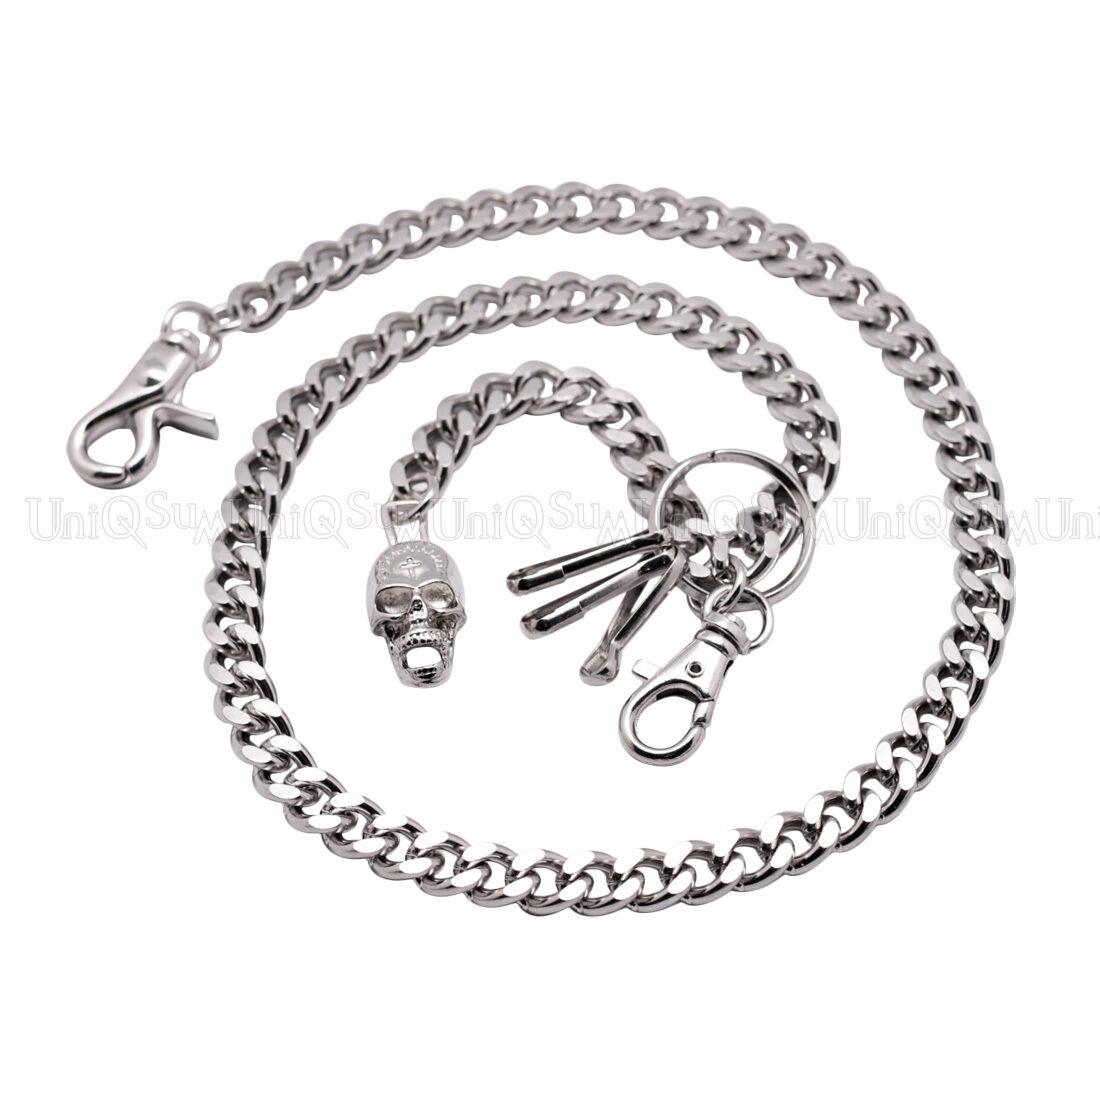 Creepy Skull Cuban Curb short wallet chain Biker Punk Trucker Key chain